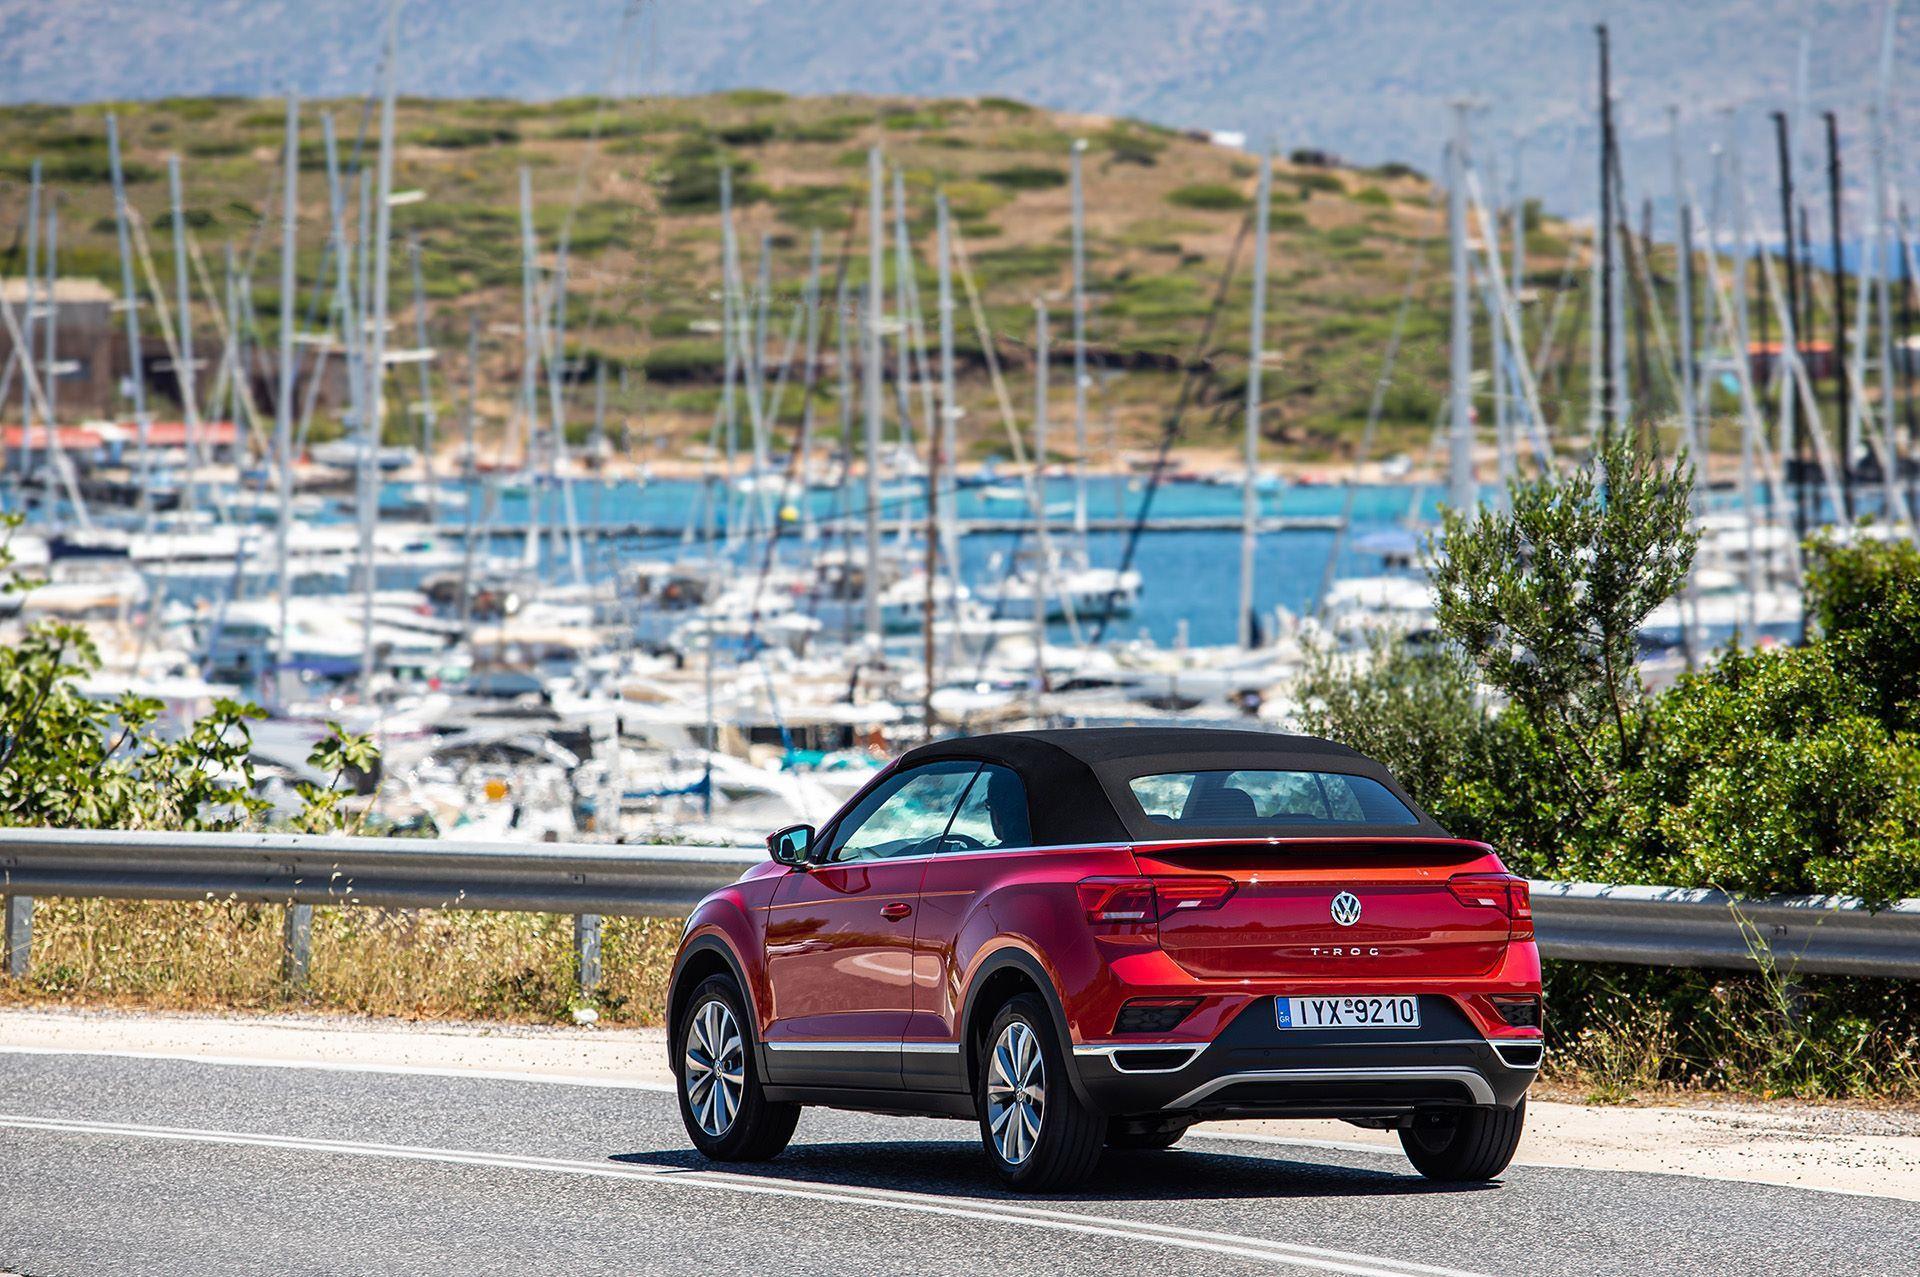 Volkswagen-T-Roc-Cabriolet-Greece-56